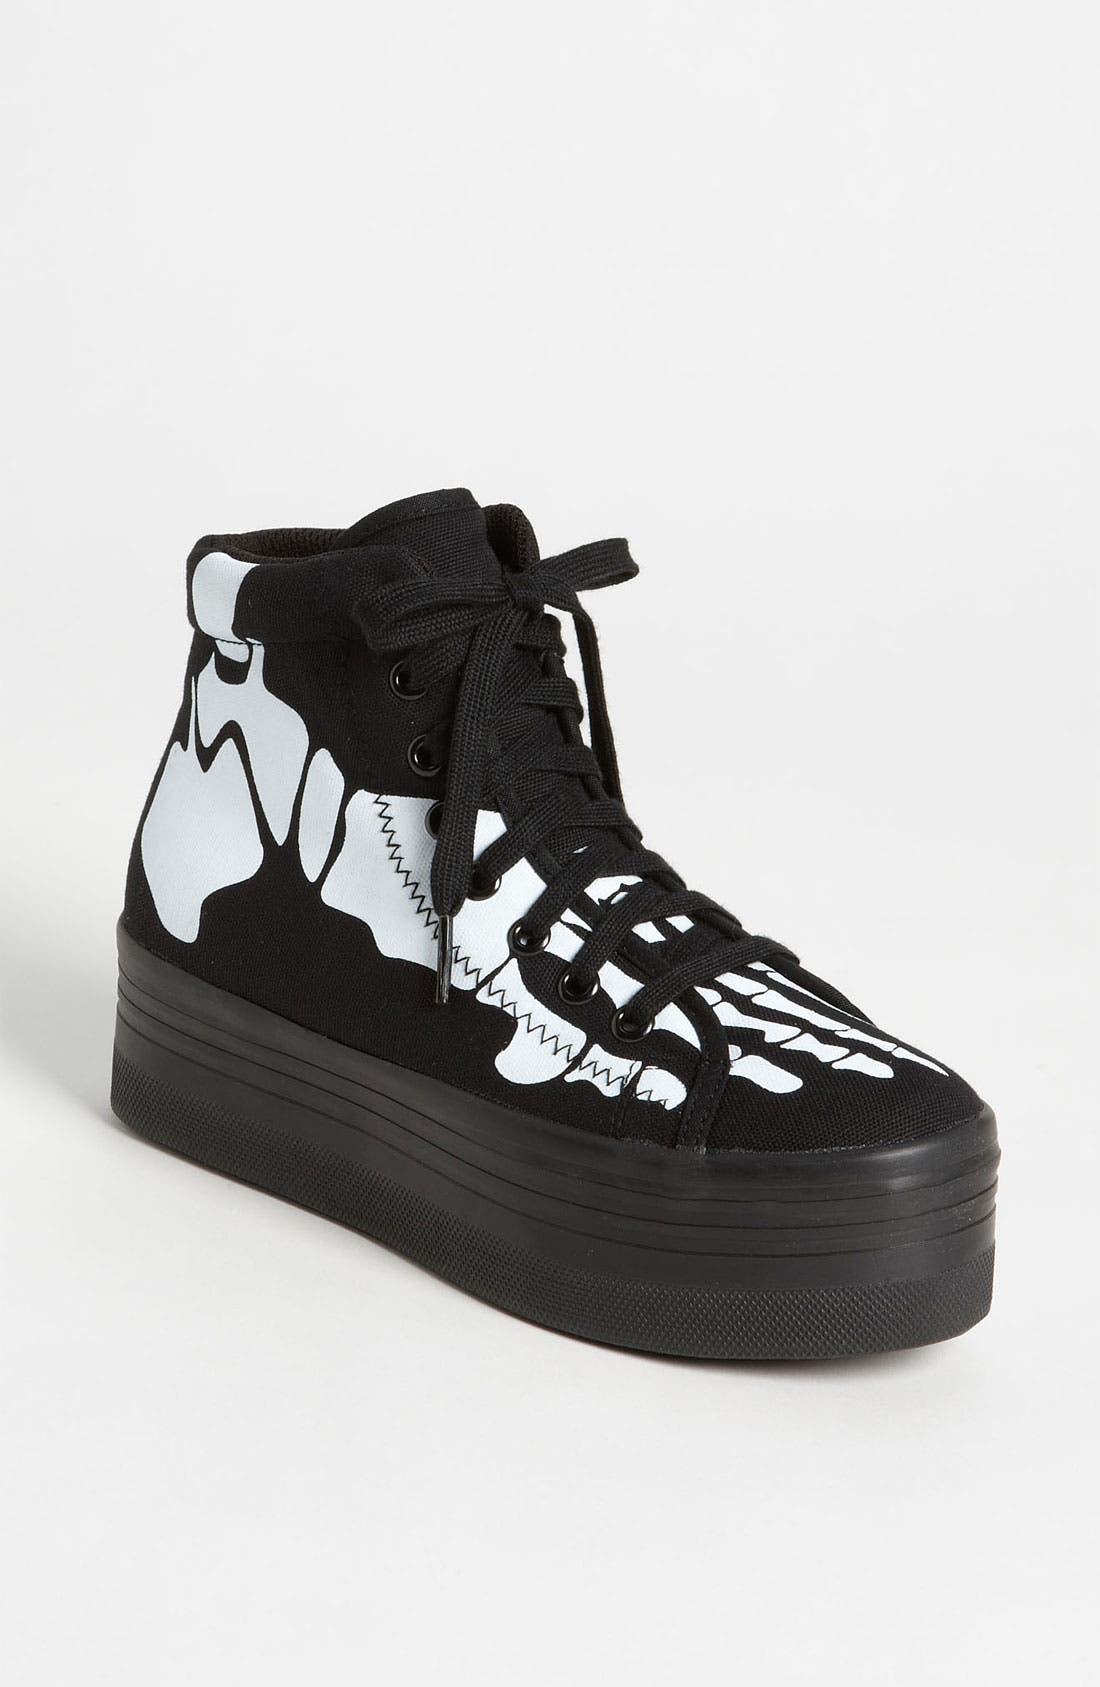 Alternate Image 1 Selected - Jeffrey Campbell 'Homg Skeleton' Sneaker